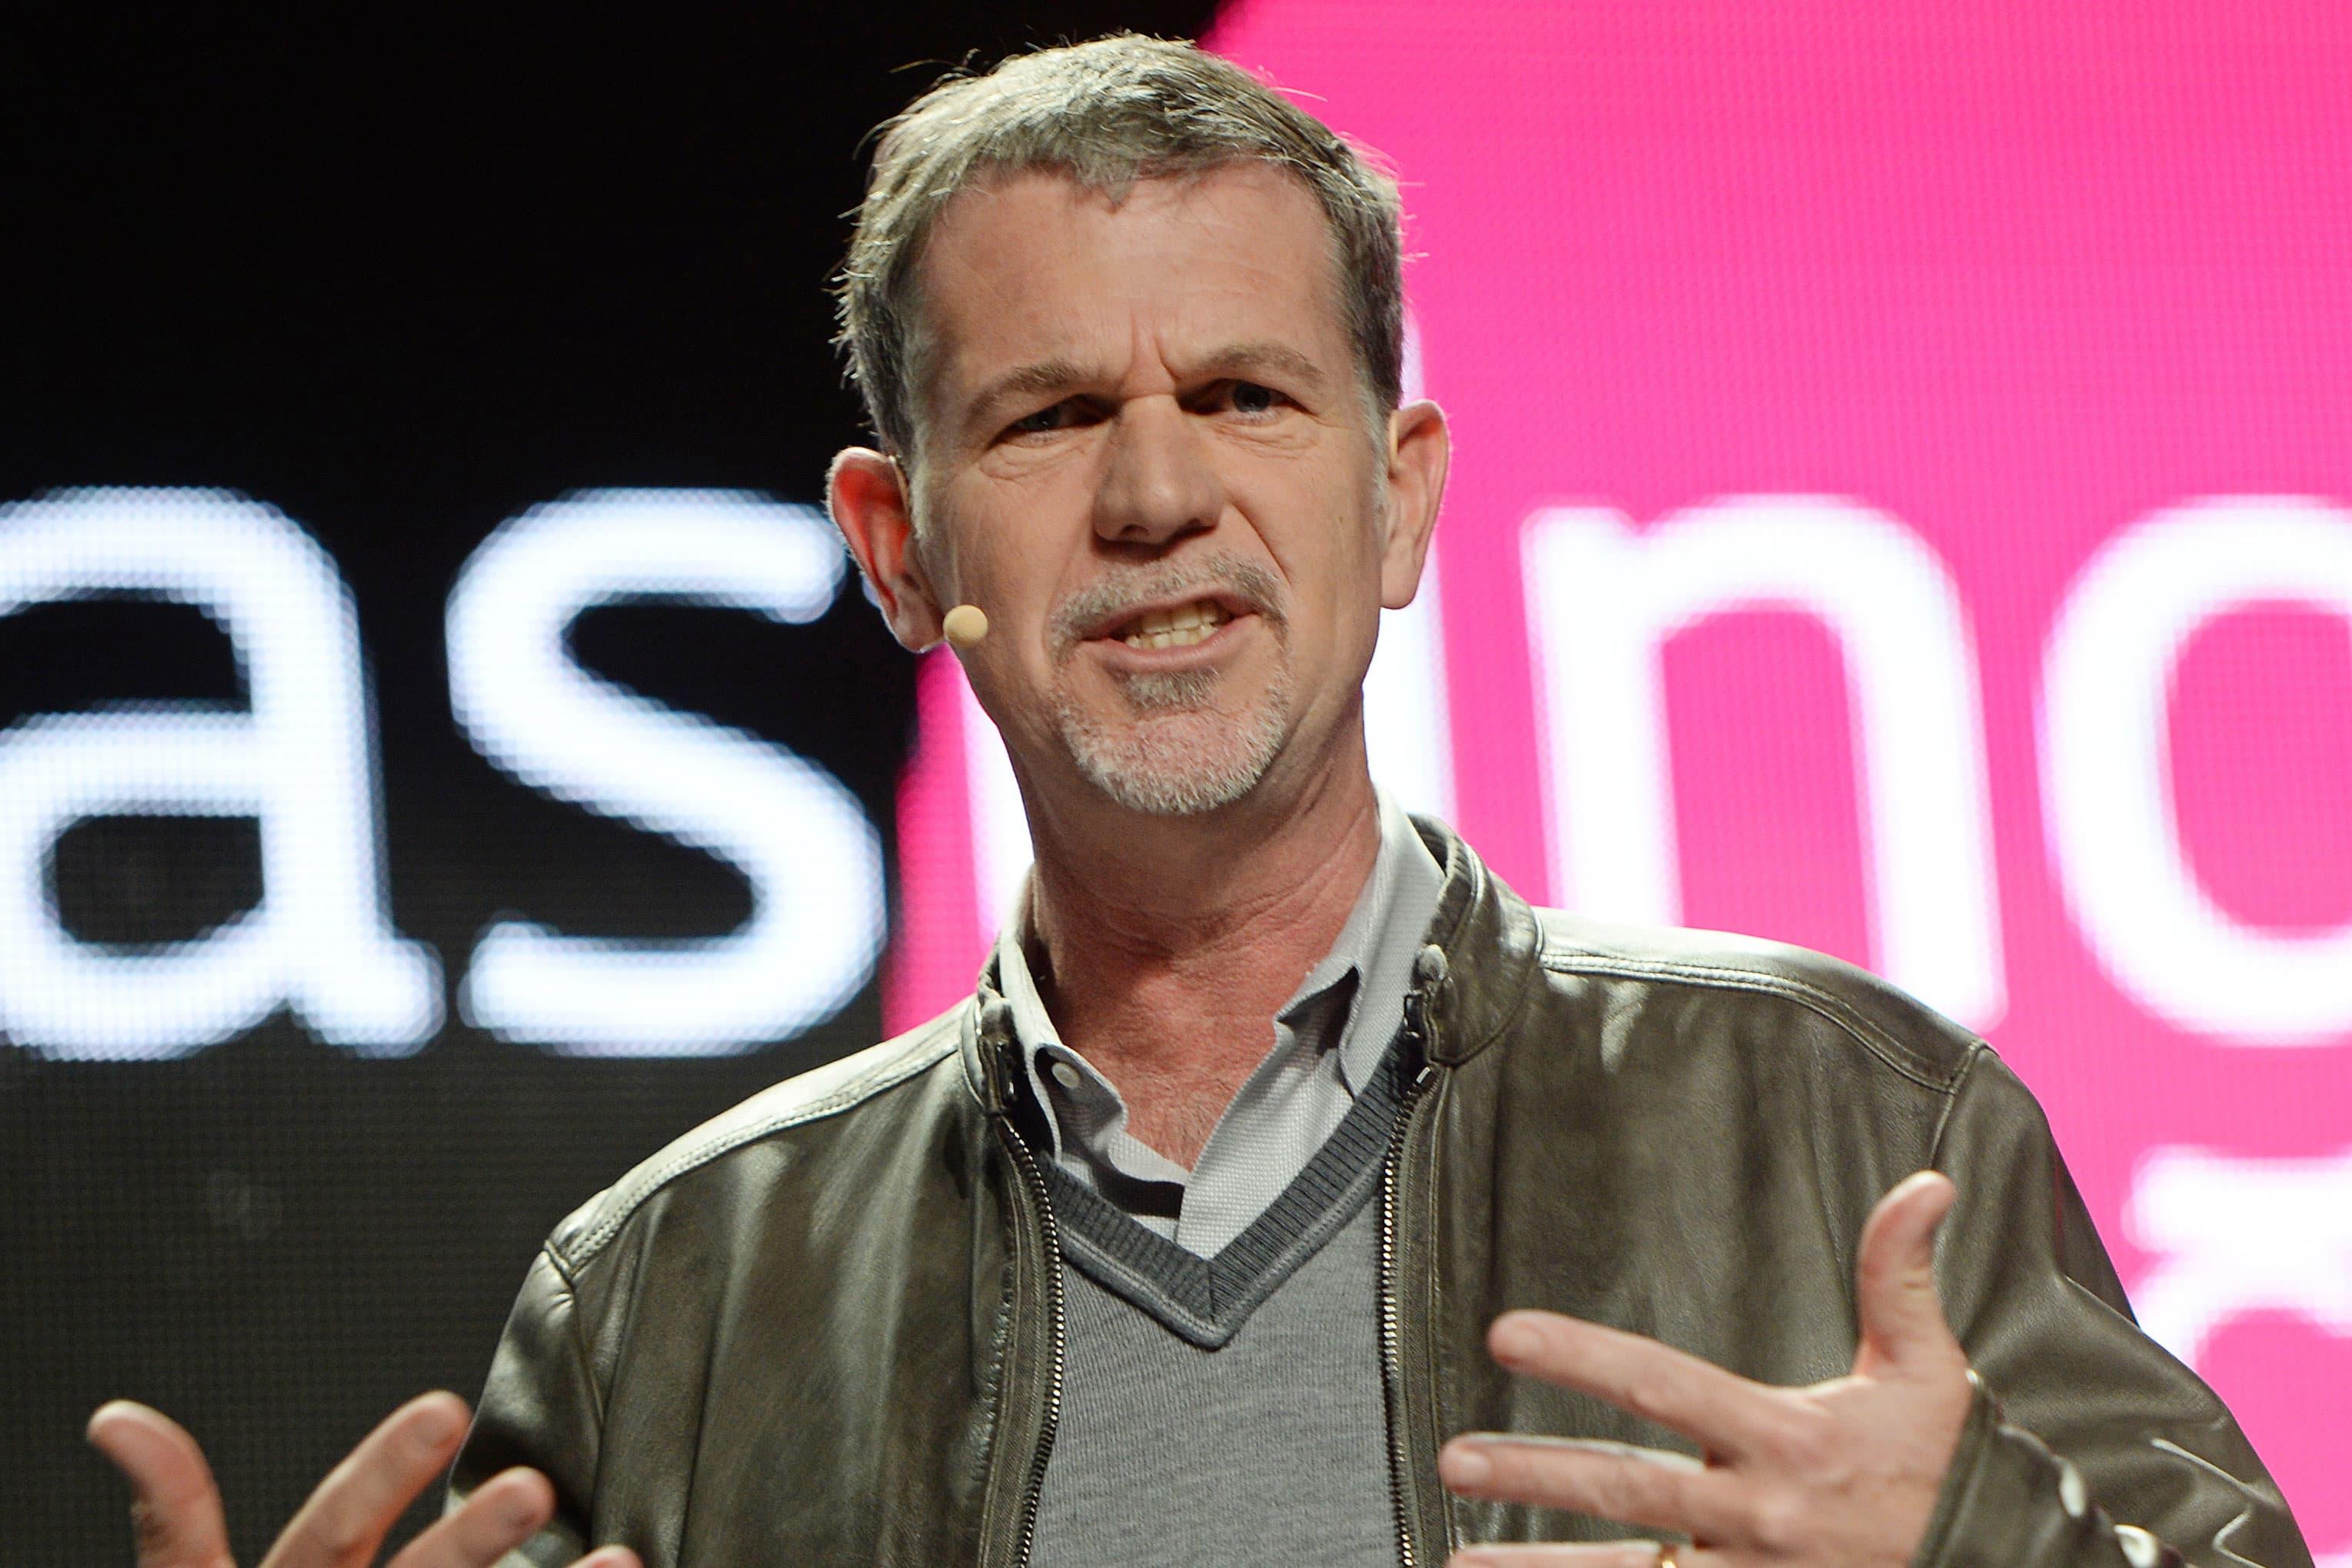 Netflix shares fall after earnings miss weak subscriber guidance for third quarter – CNBC